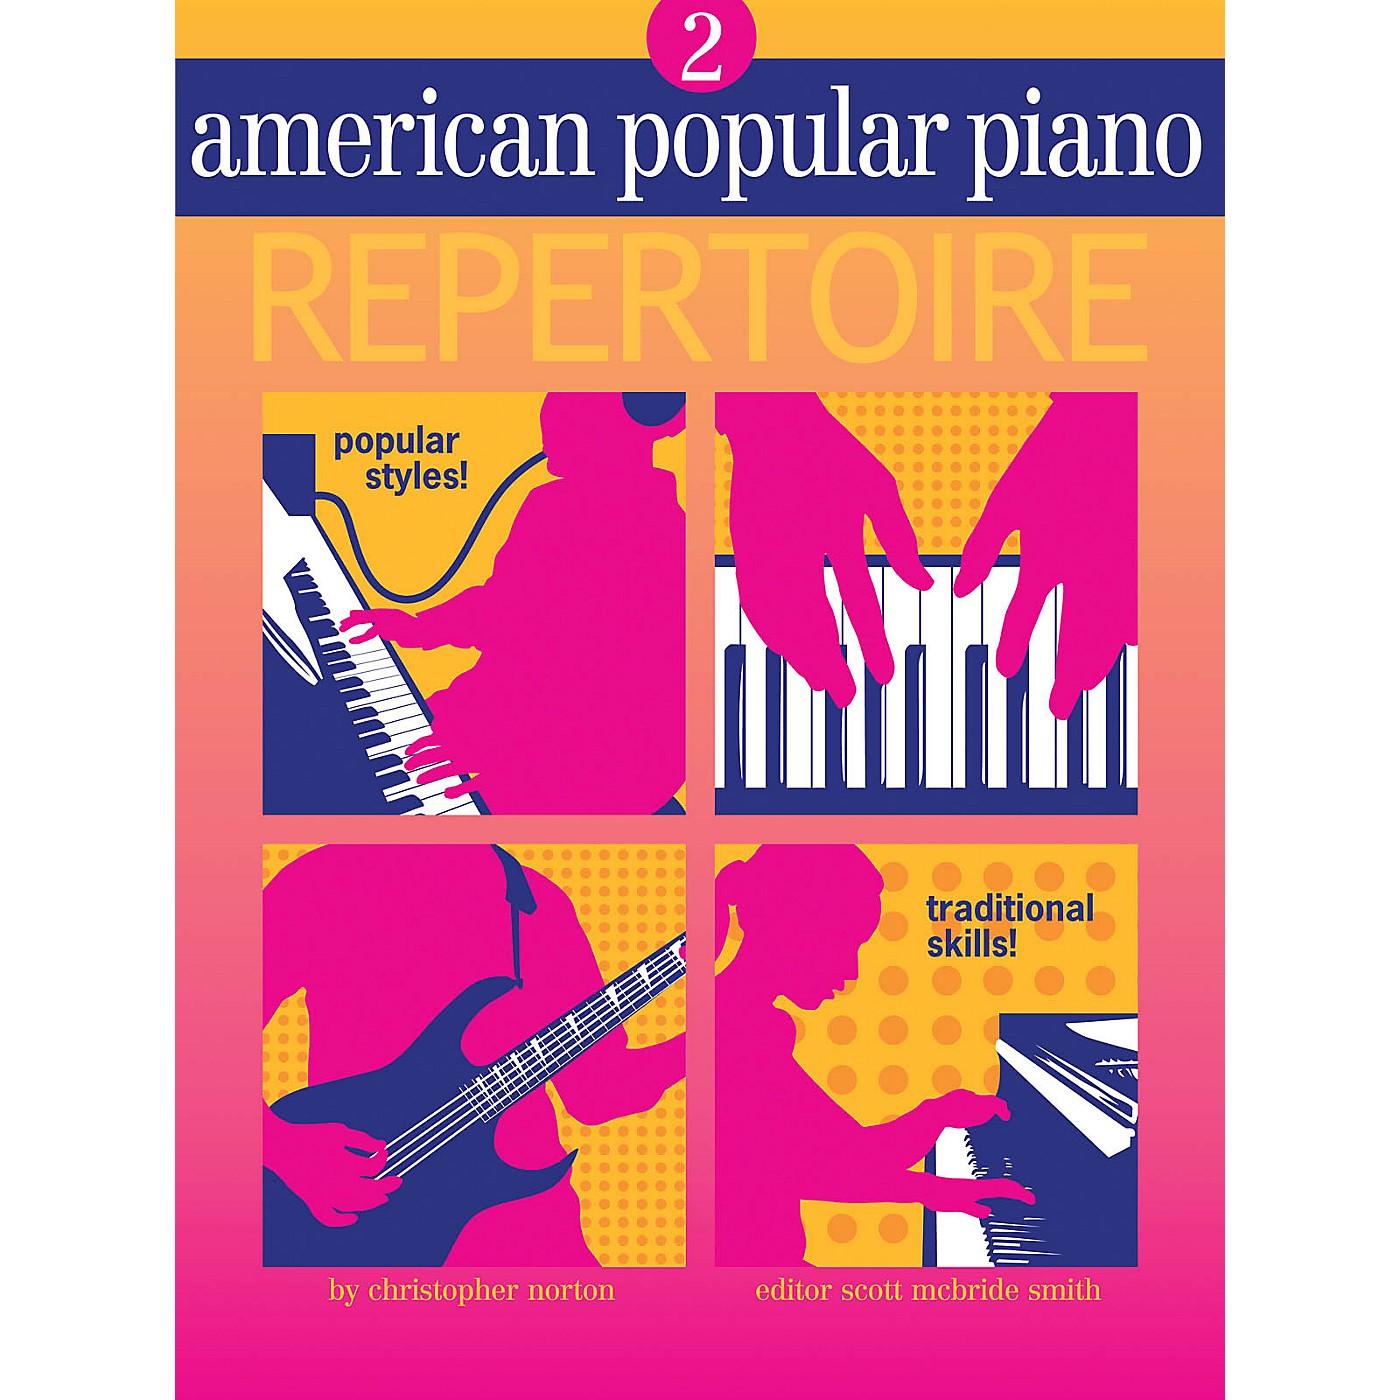 Novus Via American Popular Piano - Repertoire Novus Via Music Group Softcover Media Online by Christopher Norton thumbnail